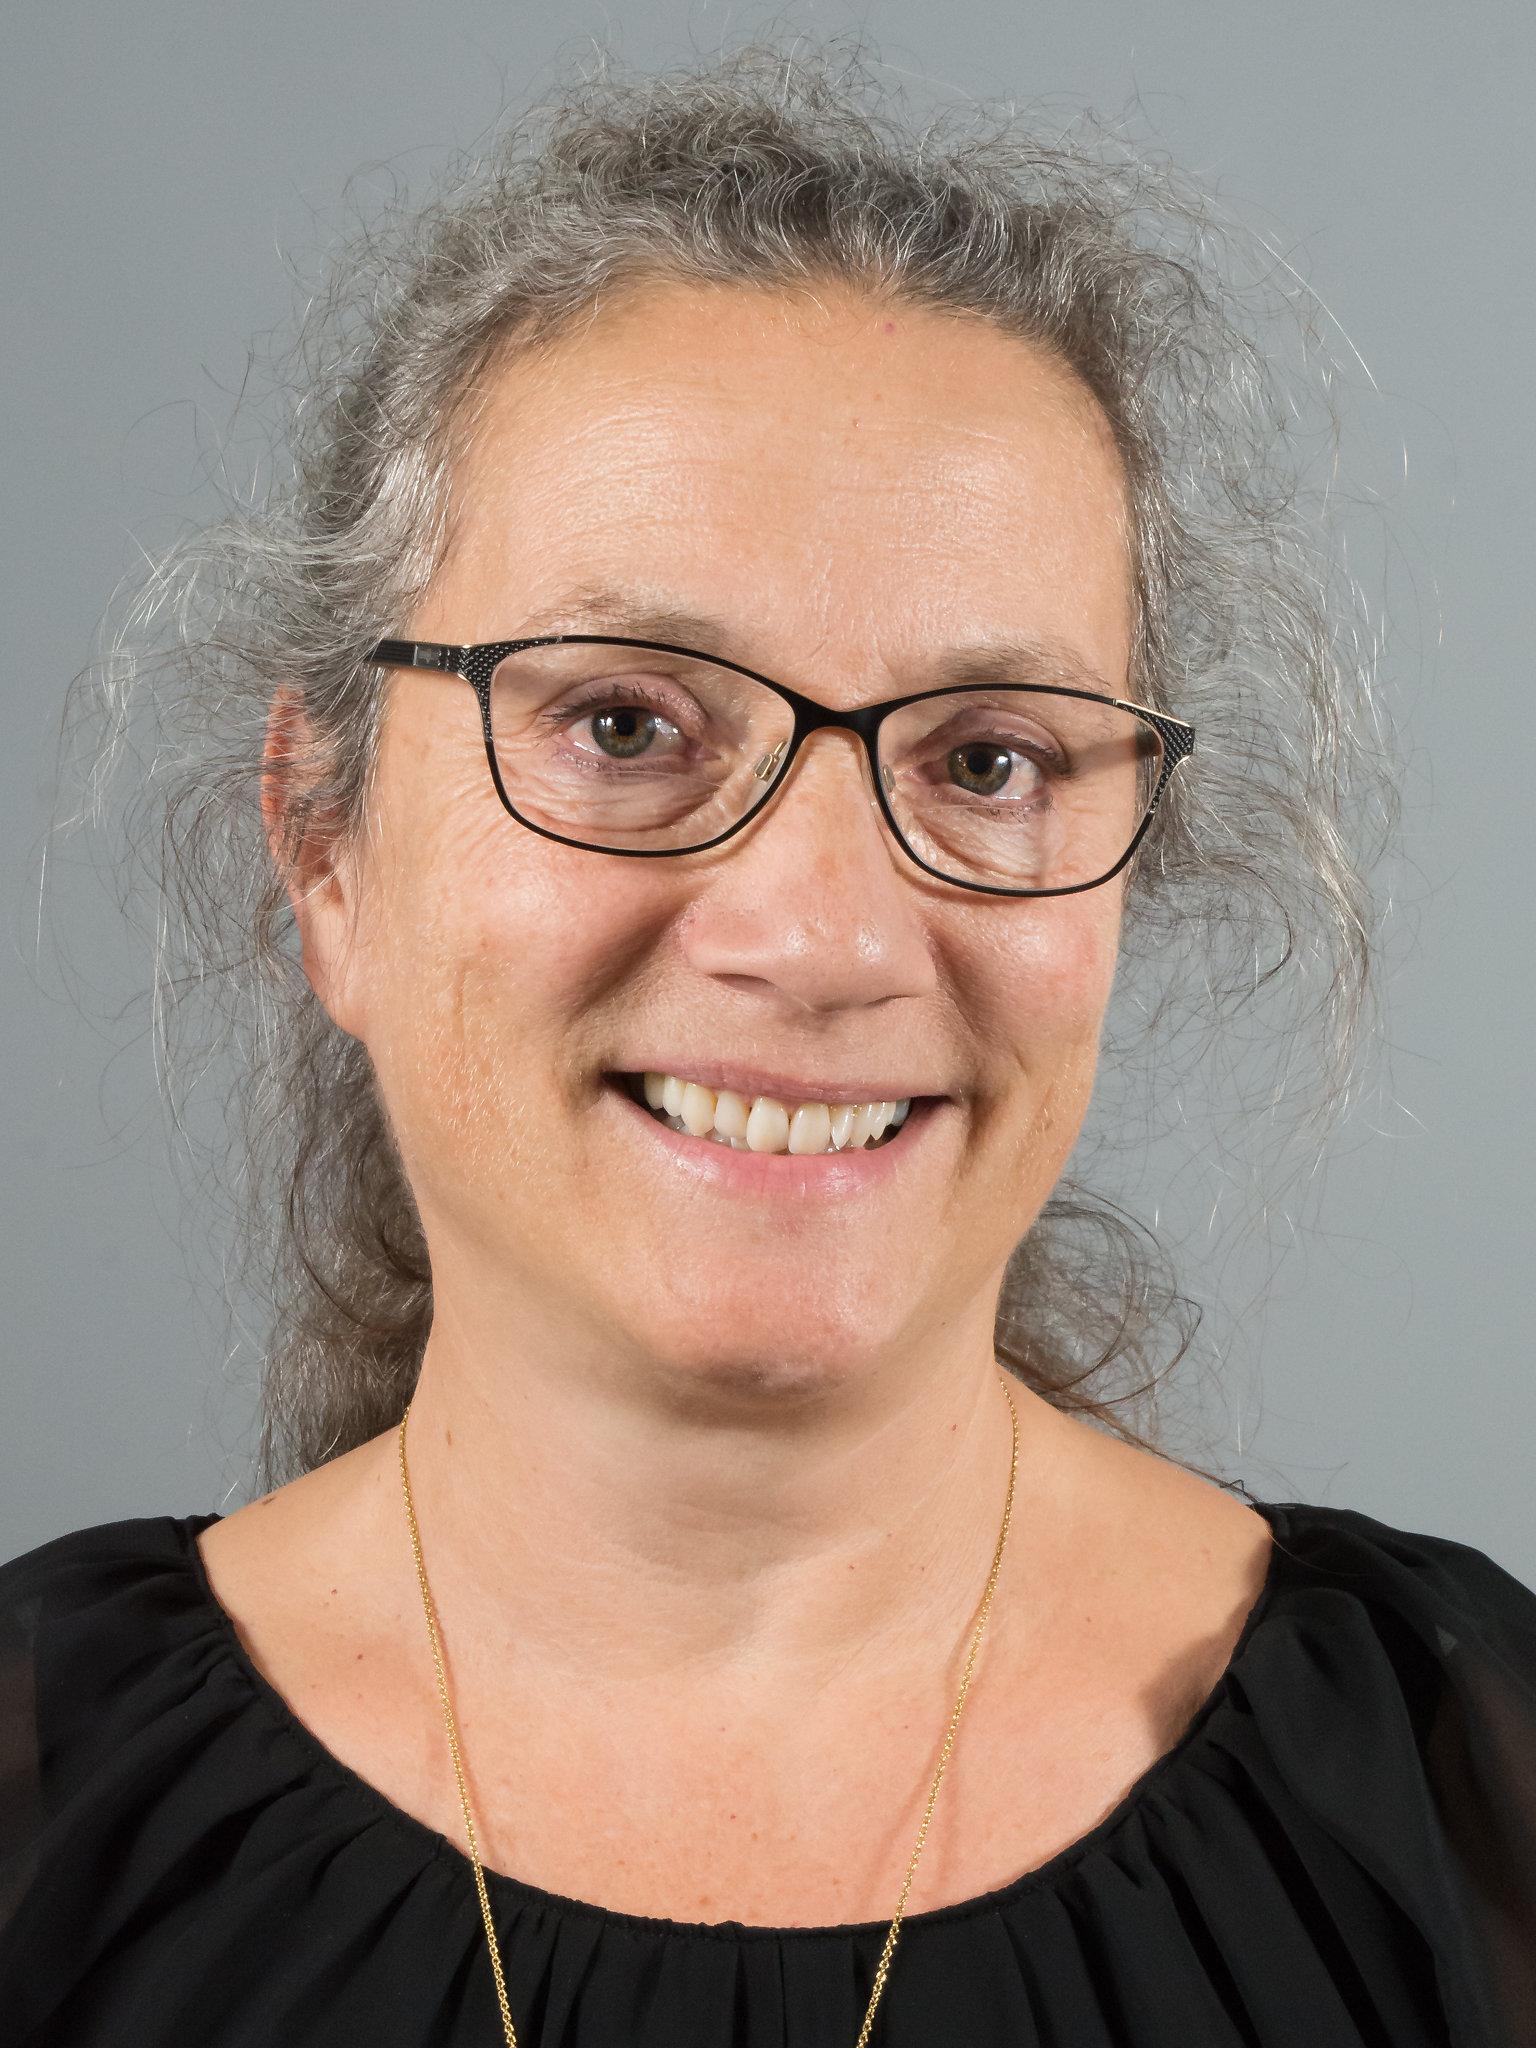 Lena Maaløe